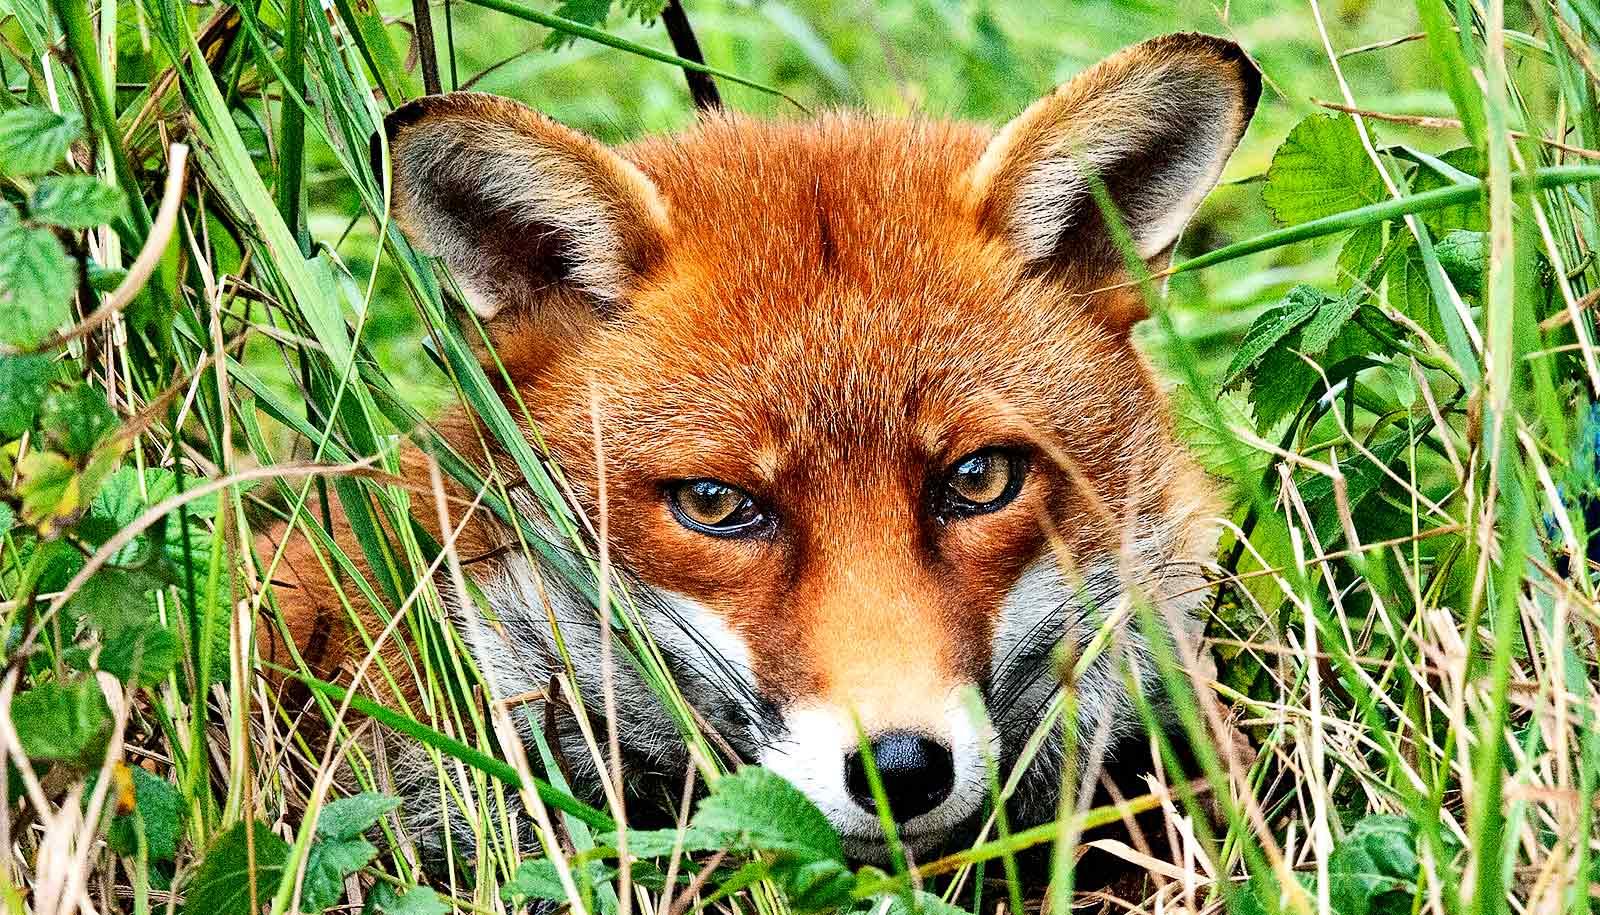 Free food lures wildlife to suburban backyards - Futurity